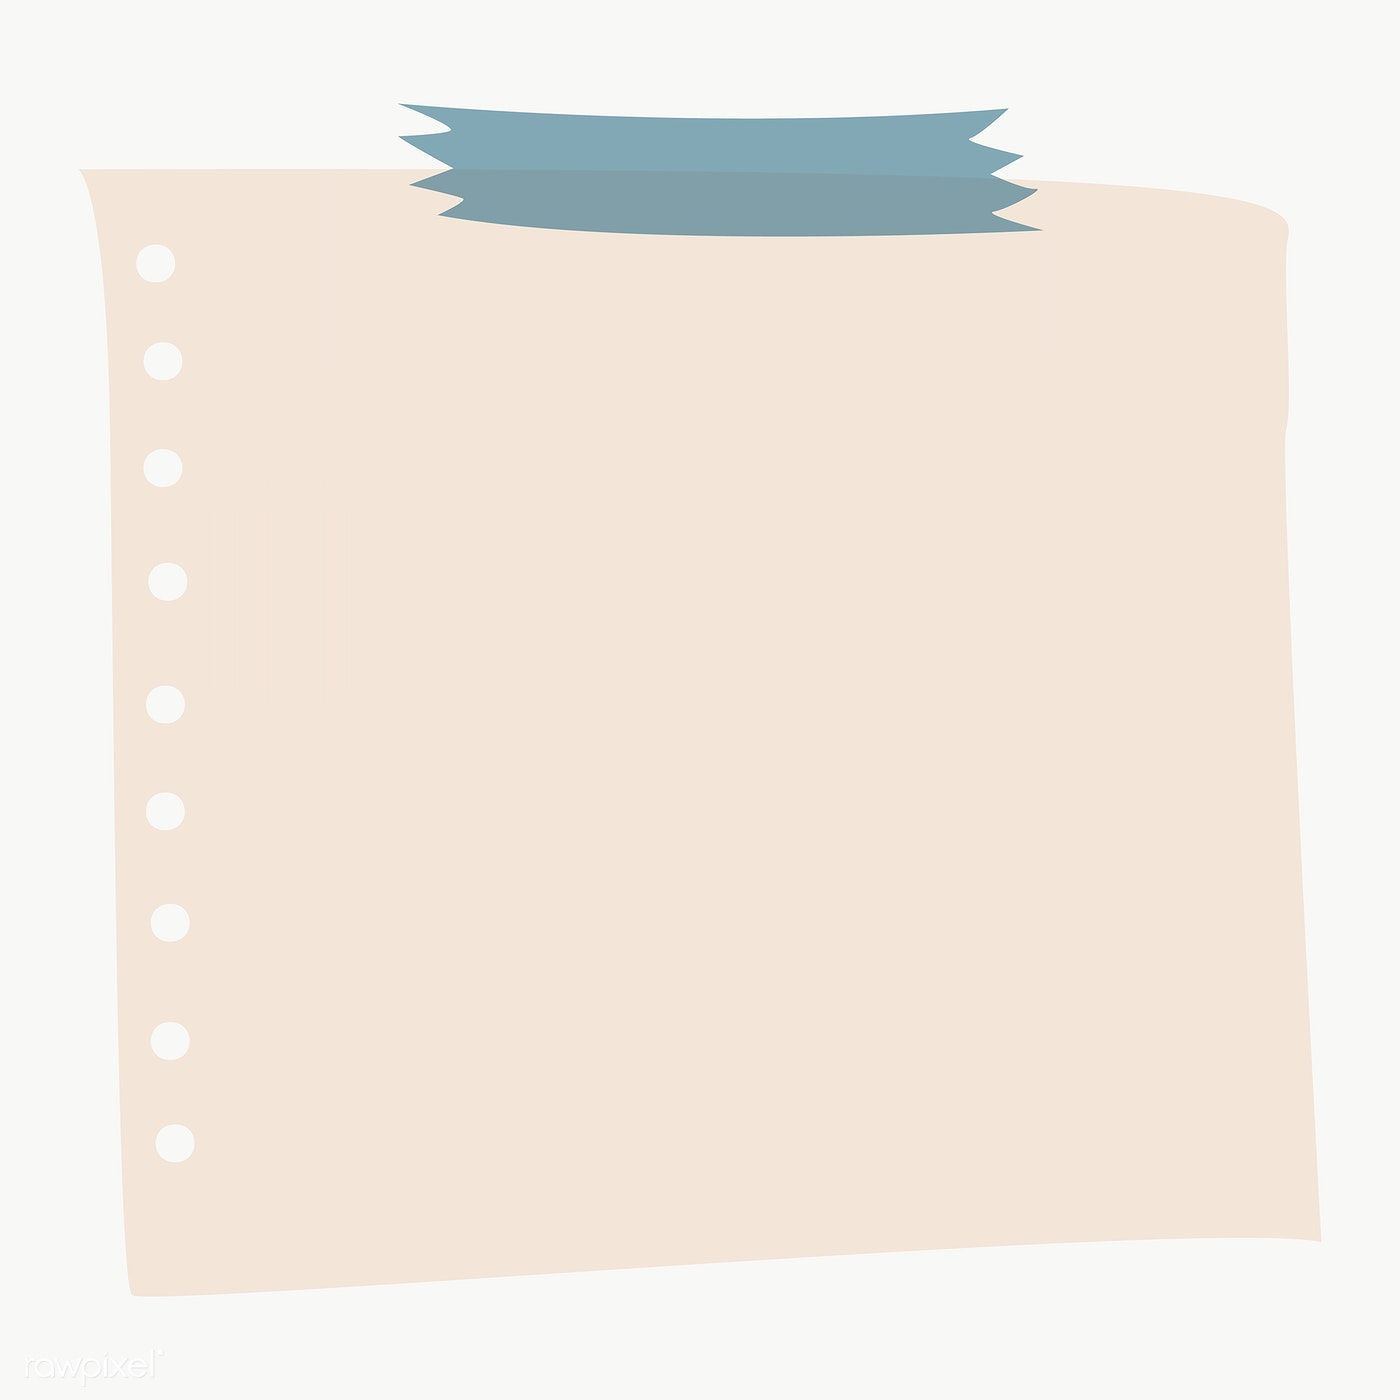 Blank Notepaper Set With Sticky Tape On Transparent Premium Image By Rawpixel Com Chayanit Fondos Para Textos Plantilla De Notas Plantillas De Cuadro